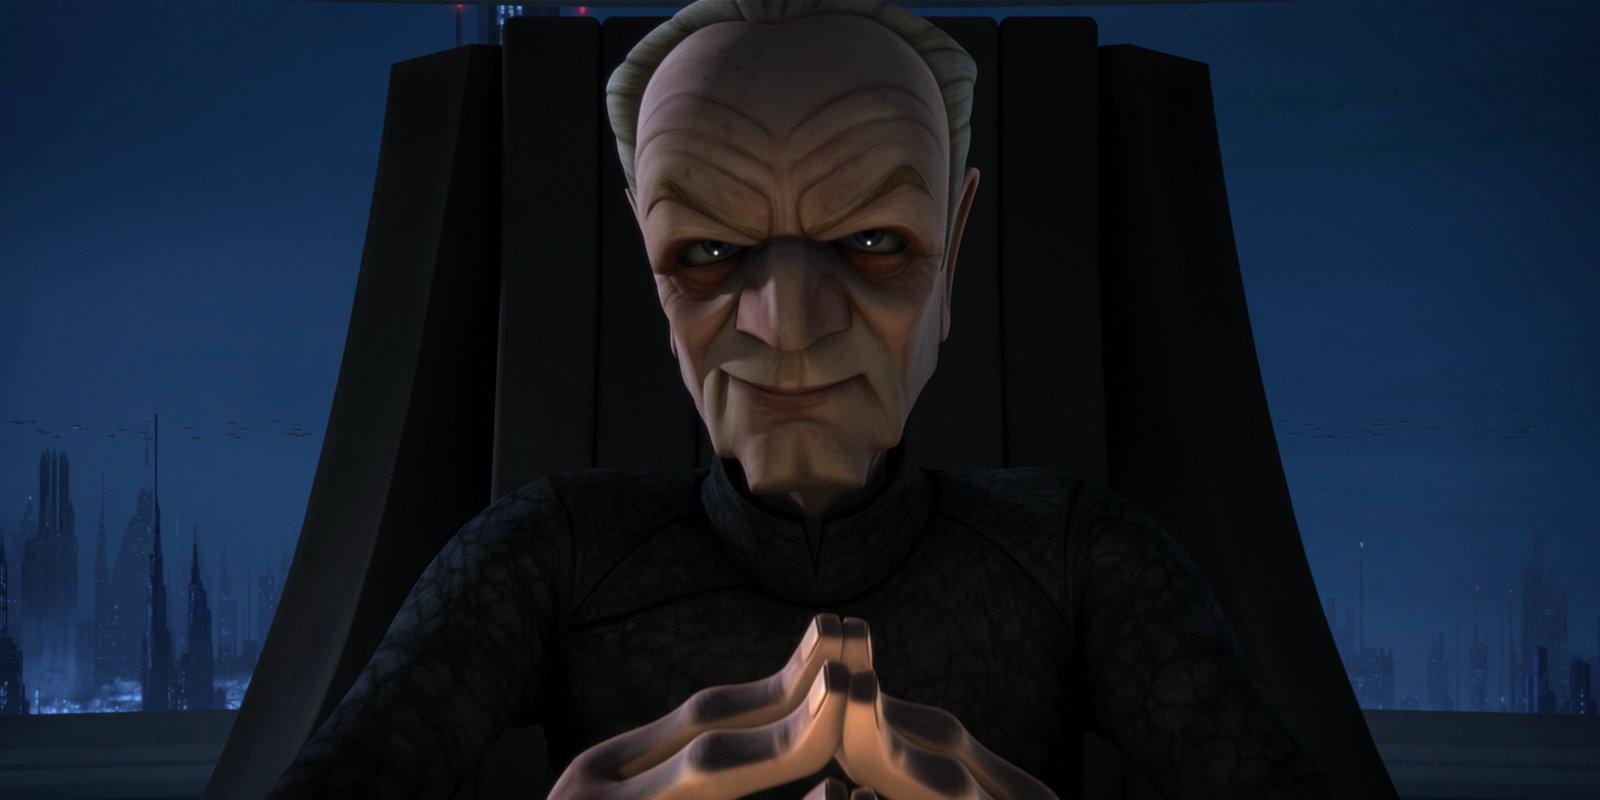 admiral เกมสล็อตโดยไม่ต้องลงทะเบียน